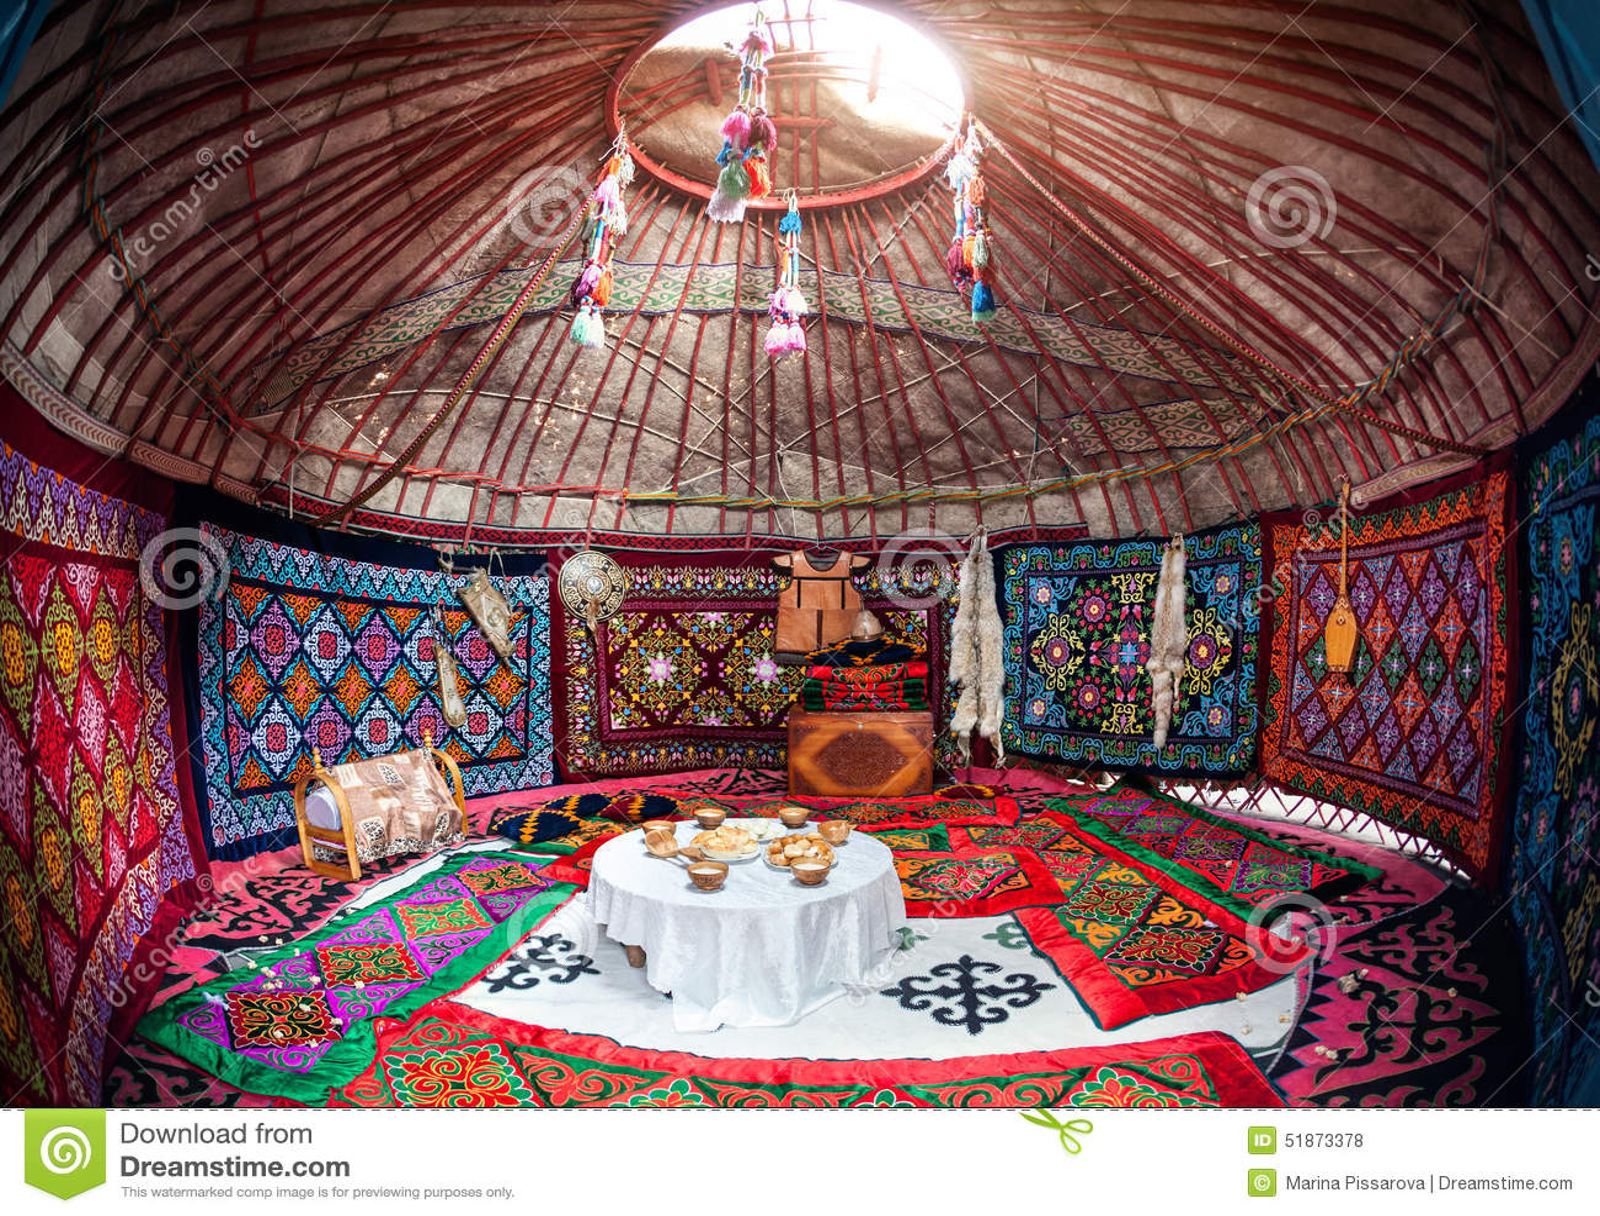 Kazakh Yurt Interior Stock Photo Image Of Kyrgyzstan